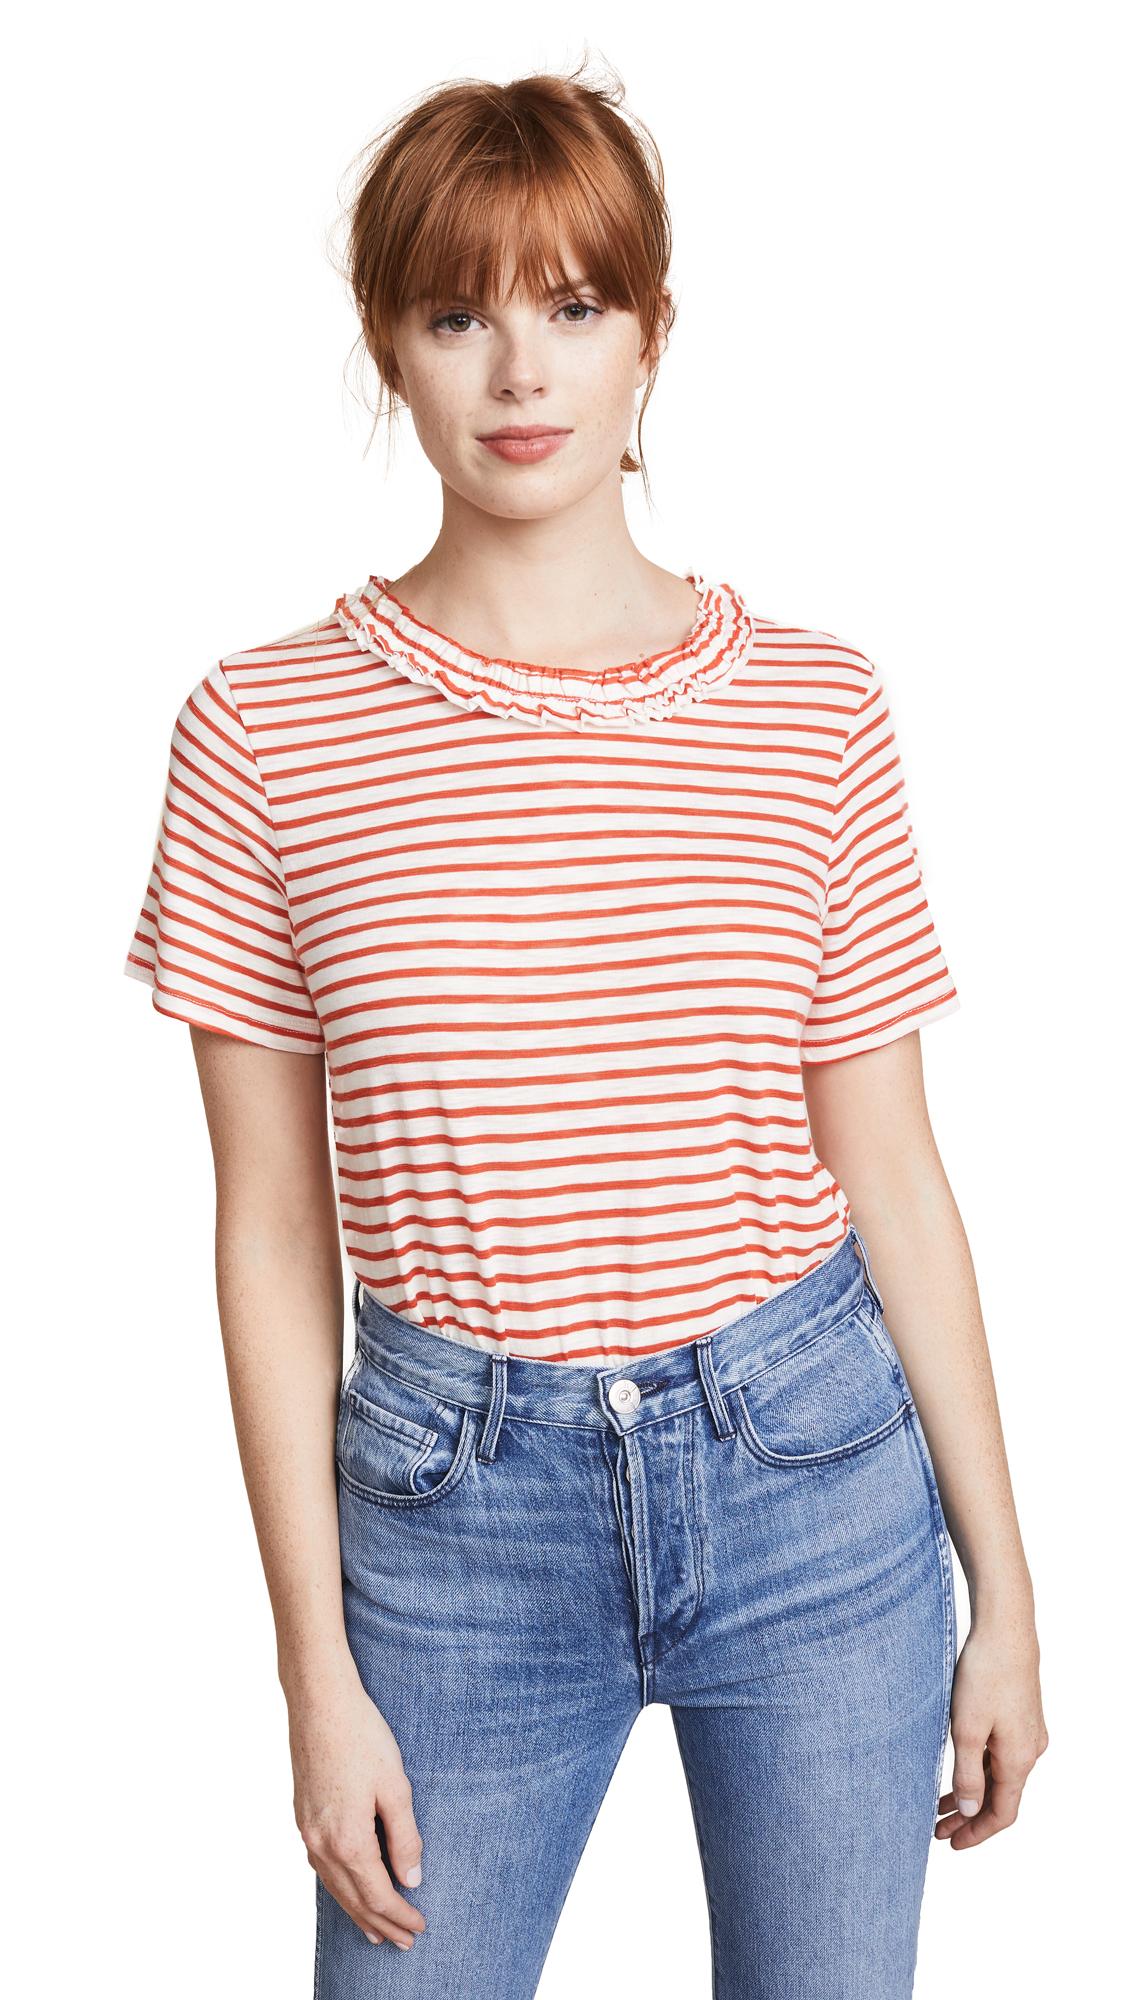 ENGLISH FACTORY Ruffle Neck T-Shirt - Red